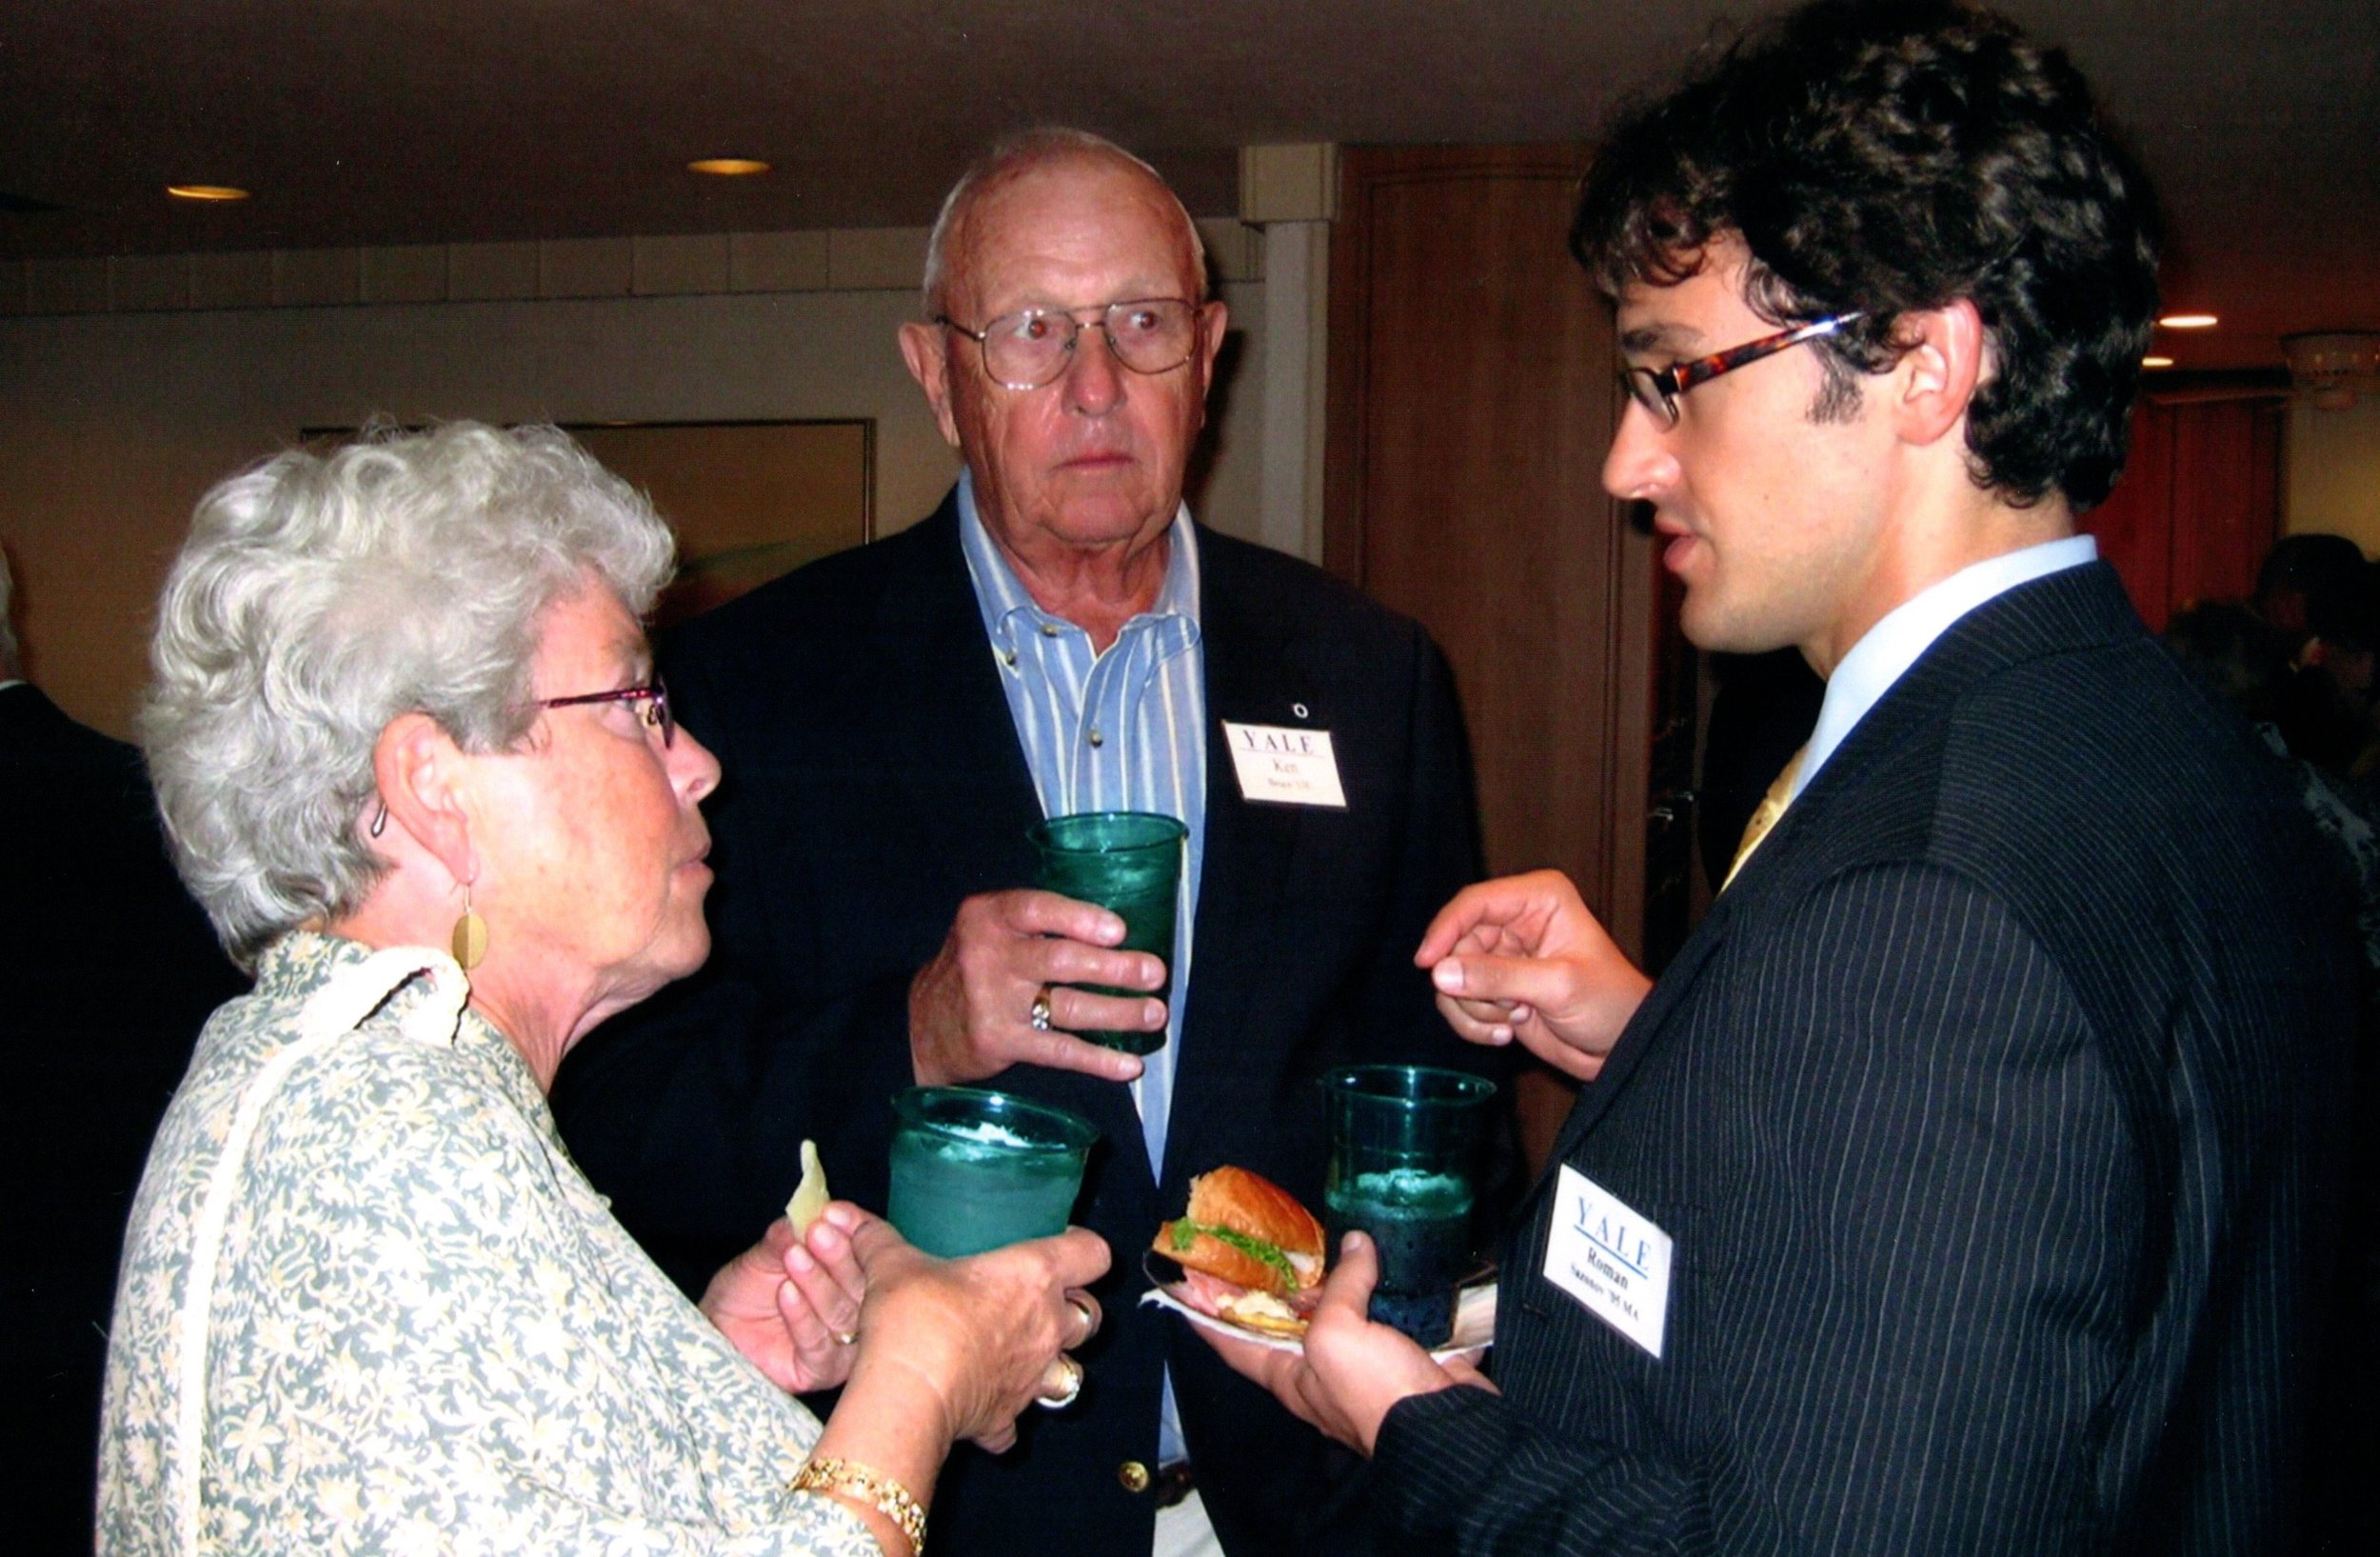 12_11_2008 - HOLIDAY PARTY - TOM WHEELER'S HOME 9.jpg